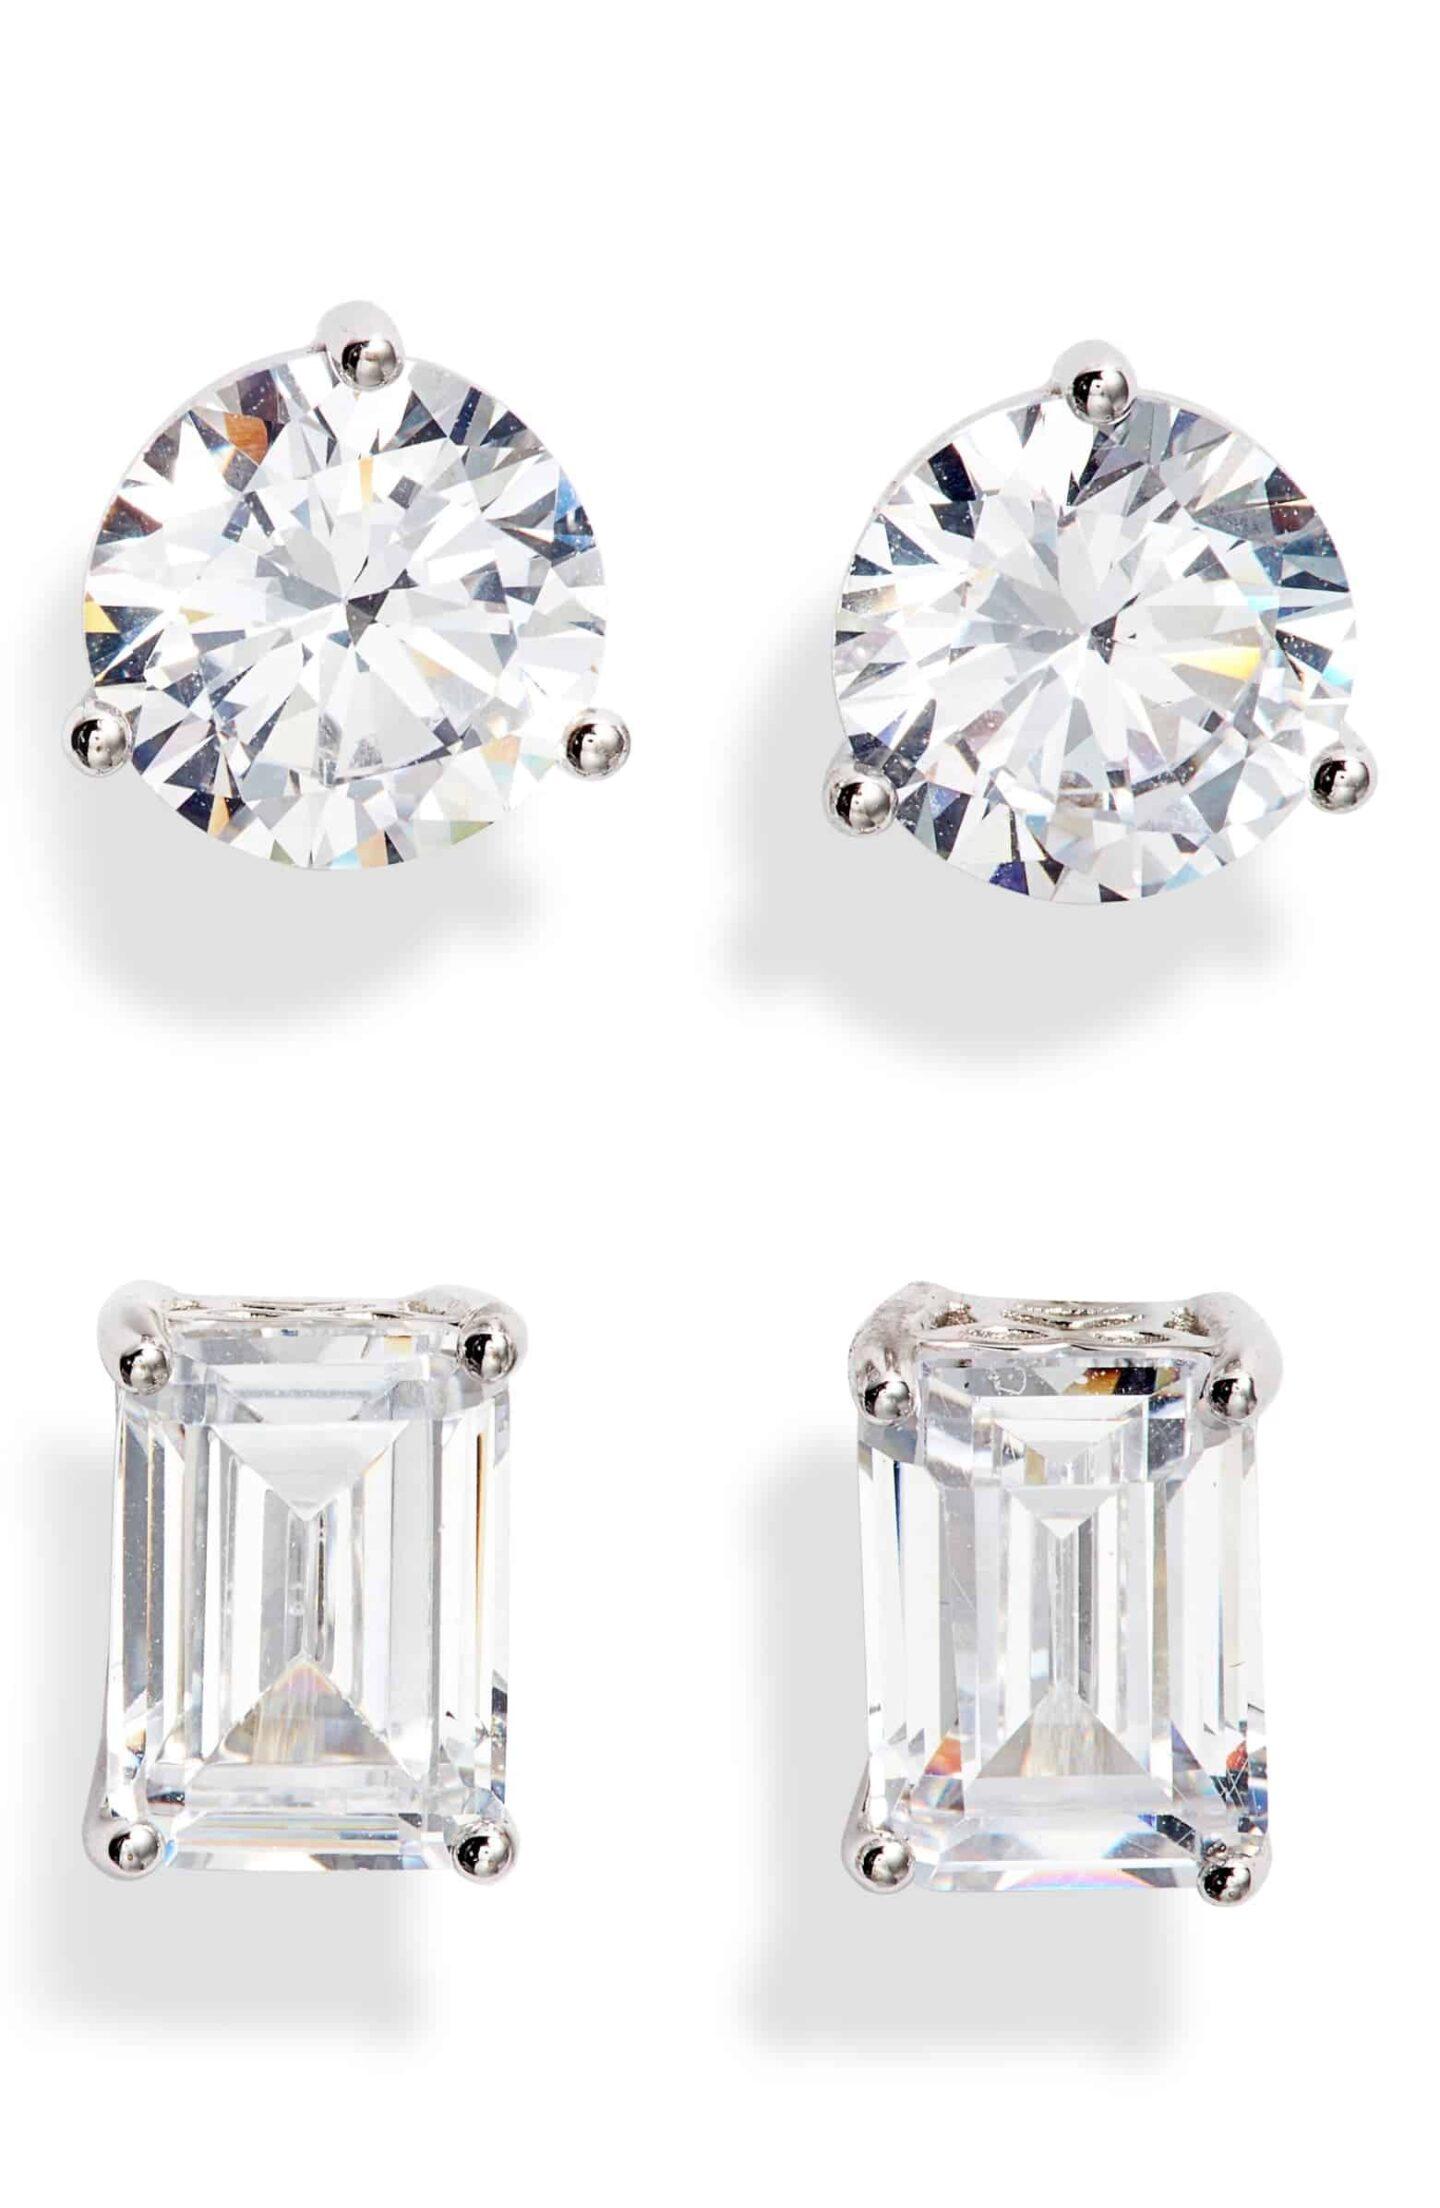 Set-of-2-Cubic-Zirconia-Stud-Earrings